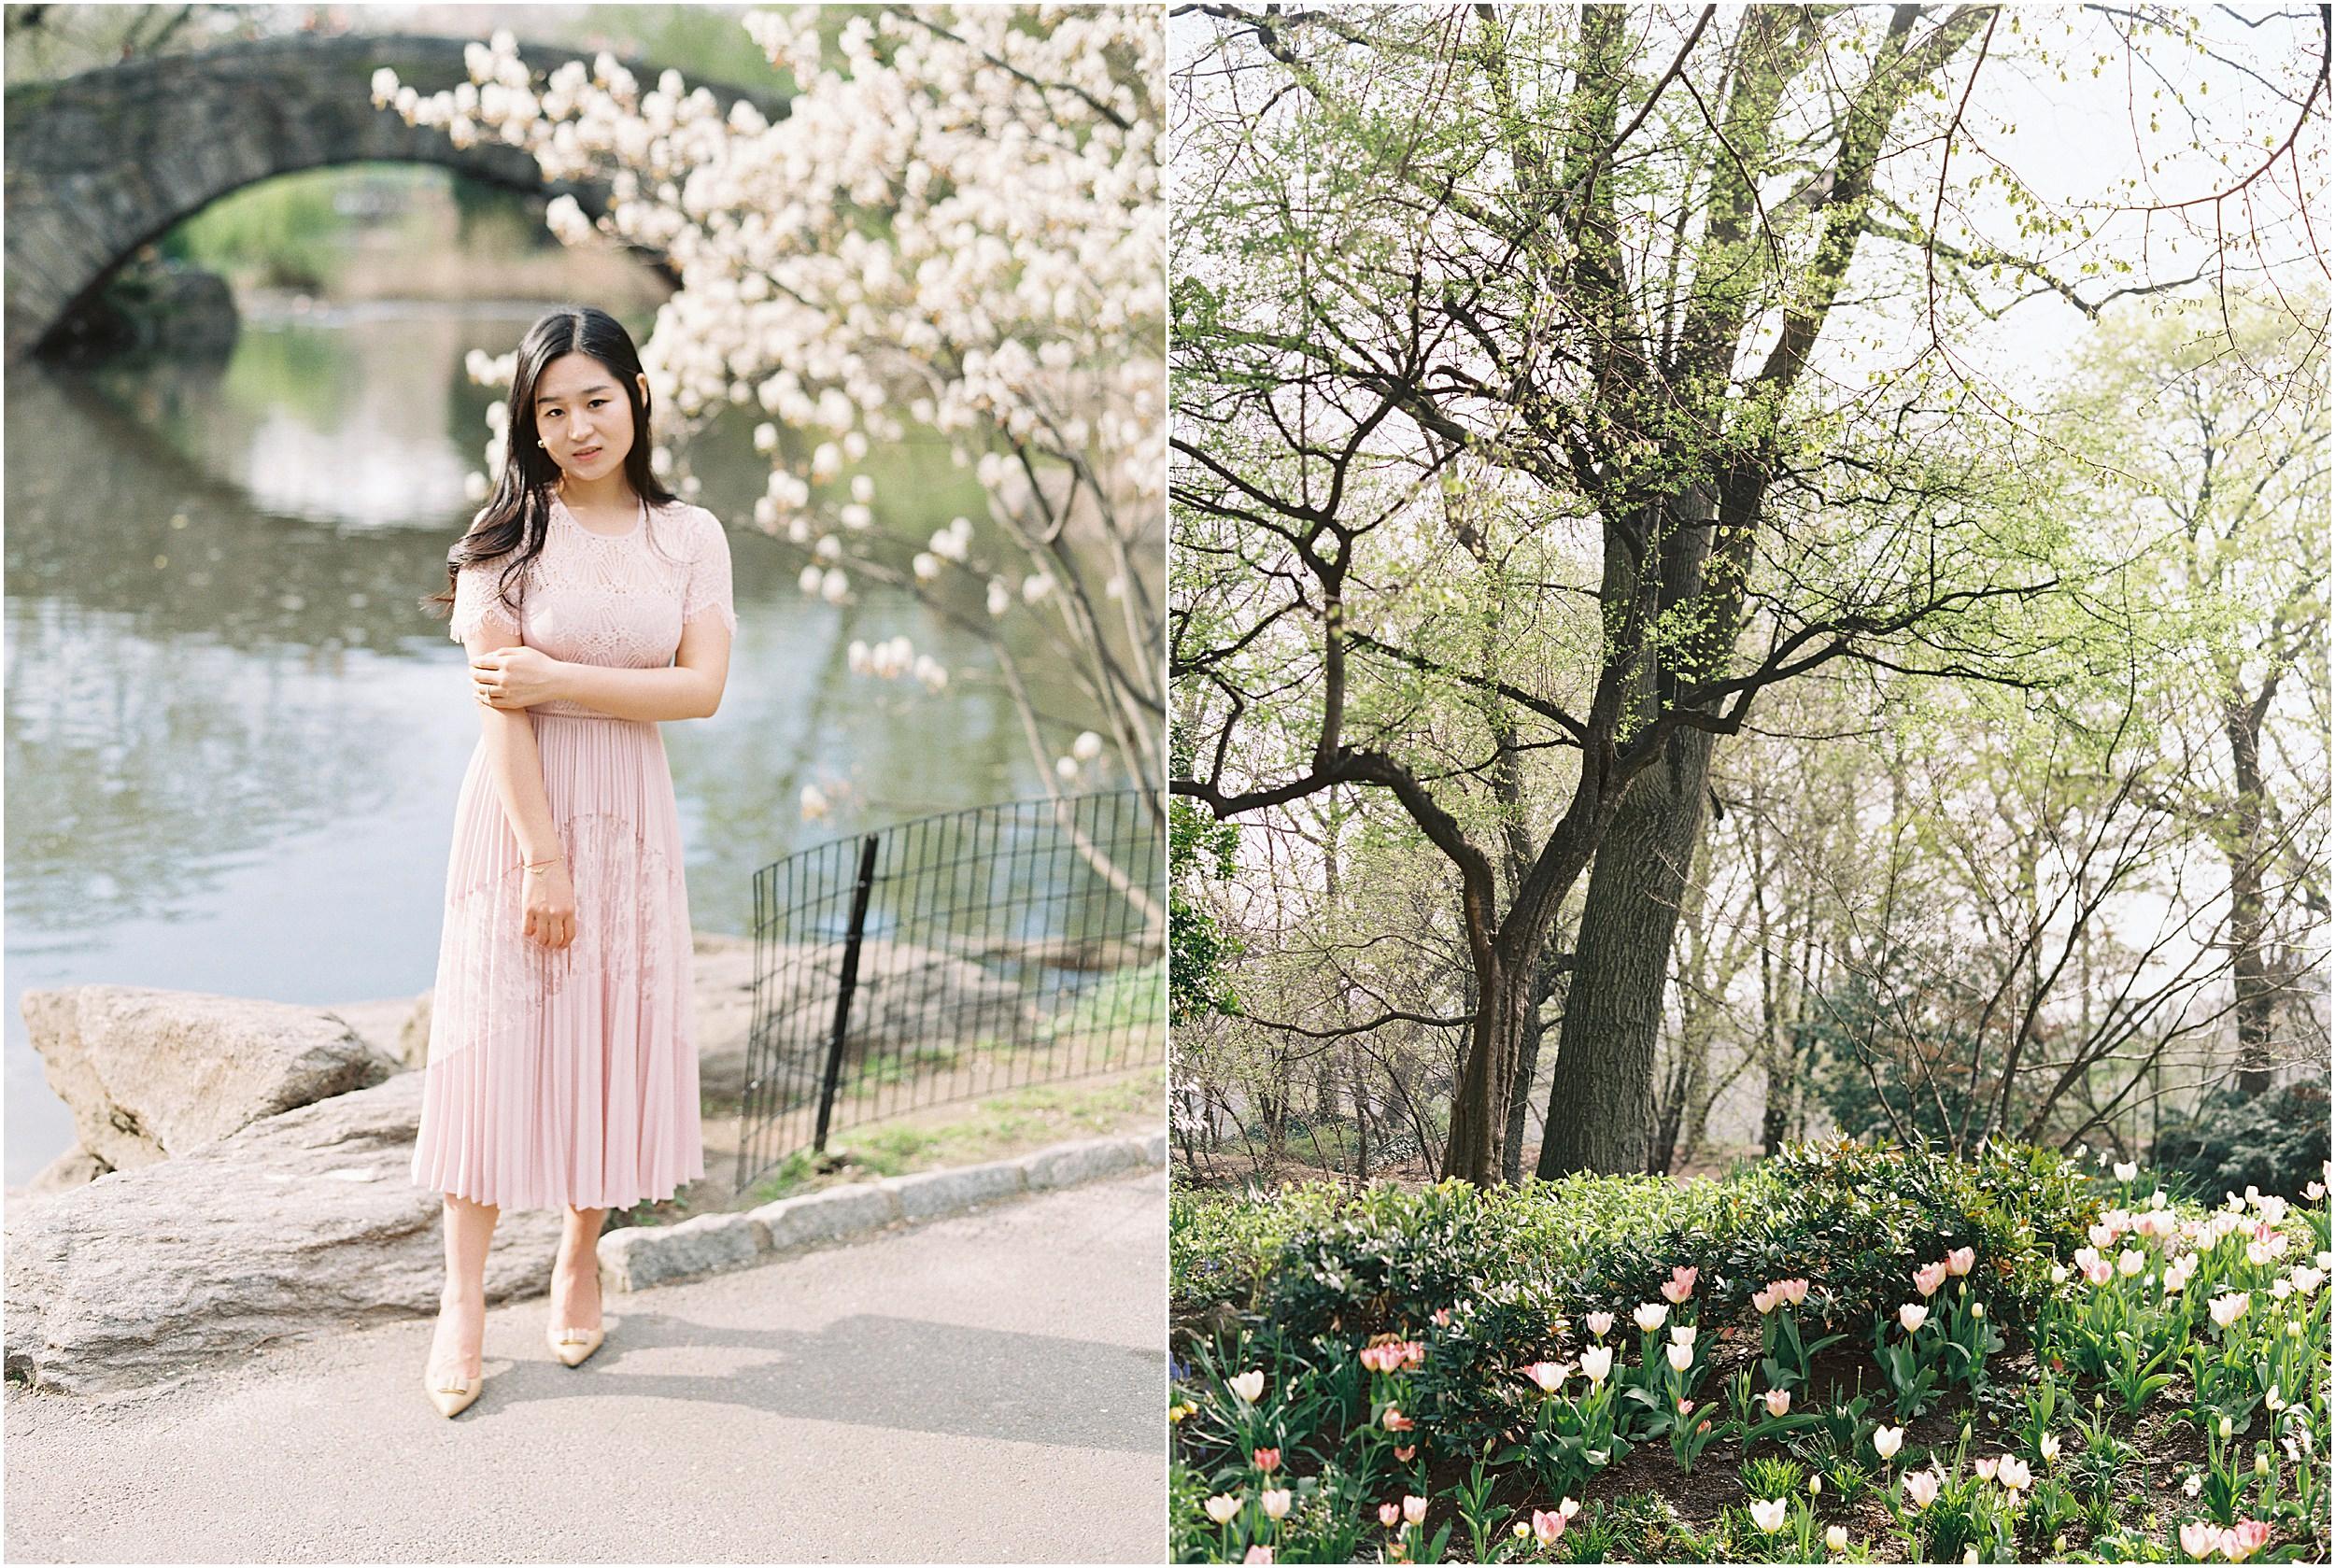 JeremiahRachelPhotography_CentralPark_NYC_SpringtimeBloom_EngagementSession0013.JPG